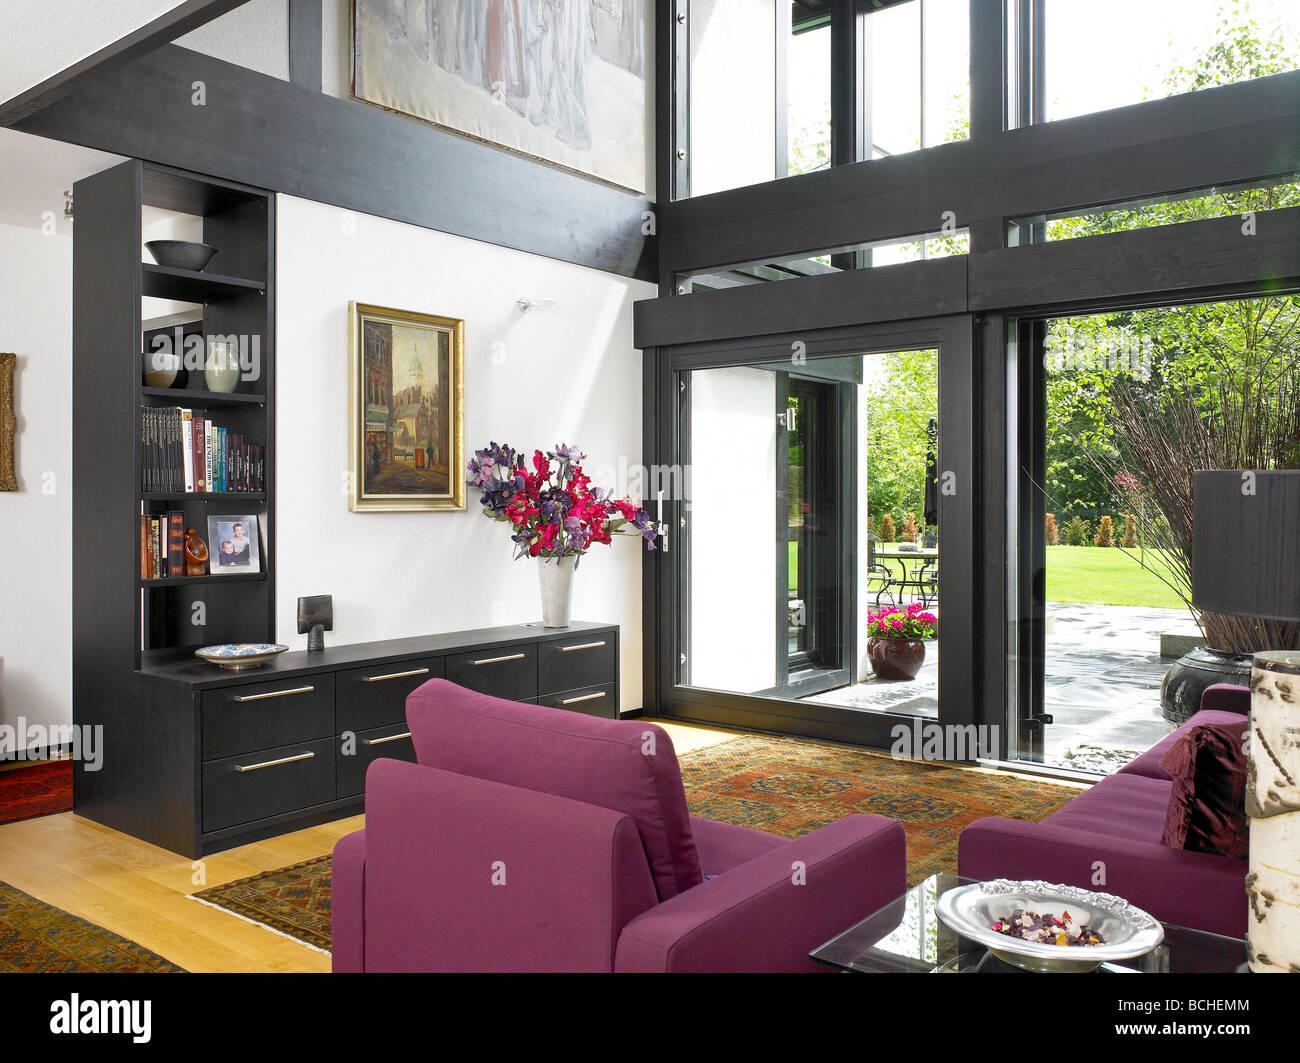 self build huf haus sitting room interior stock photo royalty free image 24970980 alamy. Black Bedroom Furniture Sets. Home Design Ideas